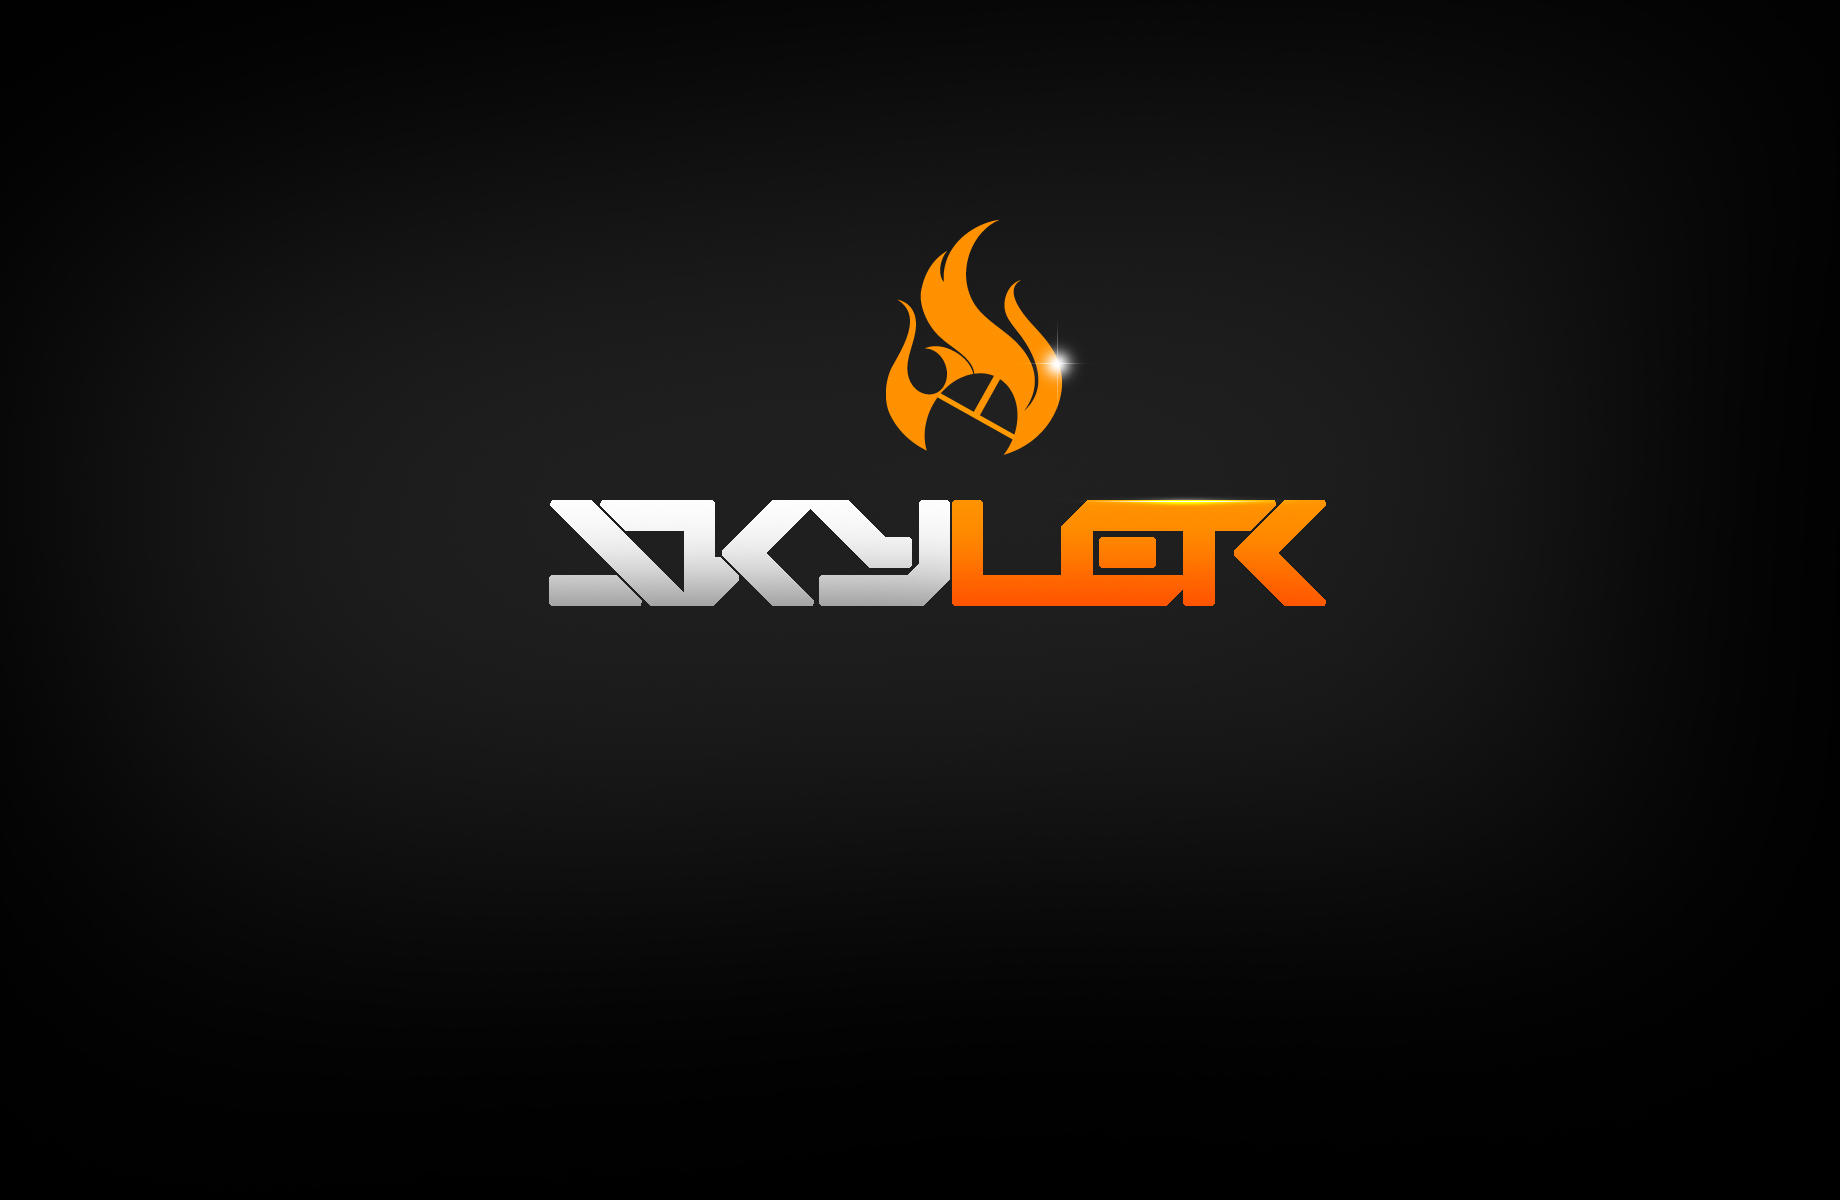 Logo Design by Jan Chua - Entry No. 211 in the Logo Design Contest Artistic Logo Design for Skyler.Asia.